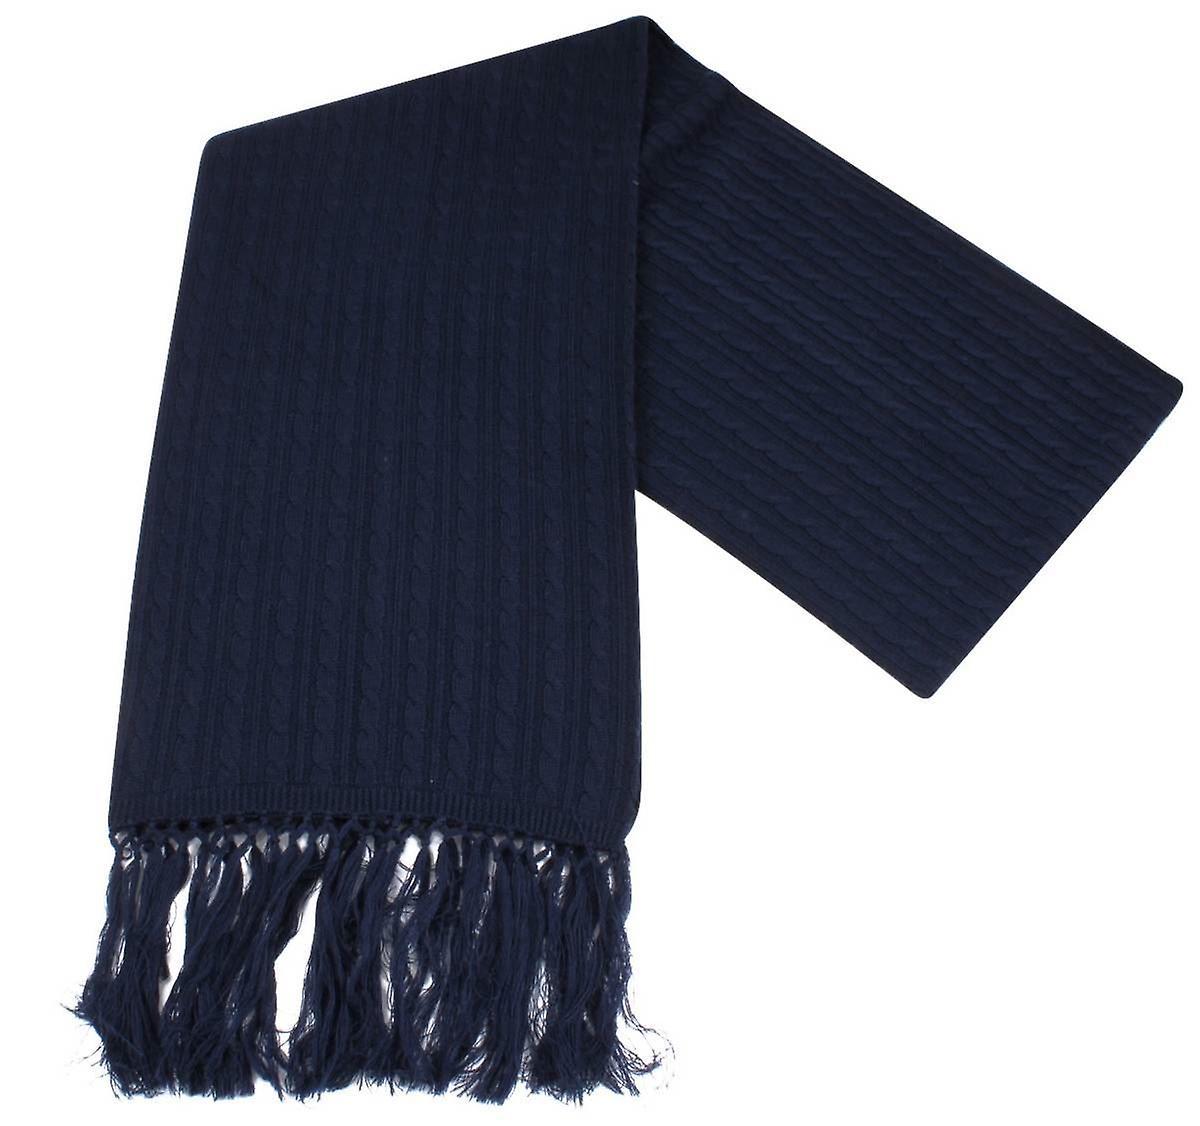 Knightsbridge cravates Knitted Wool Svoituref - Navy